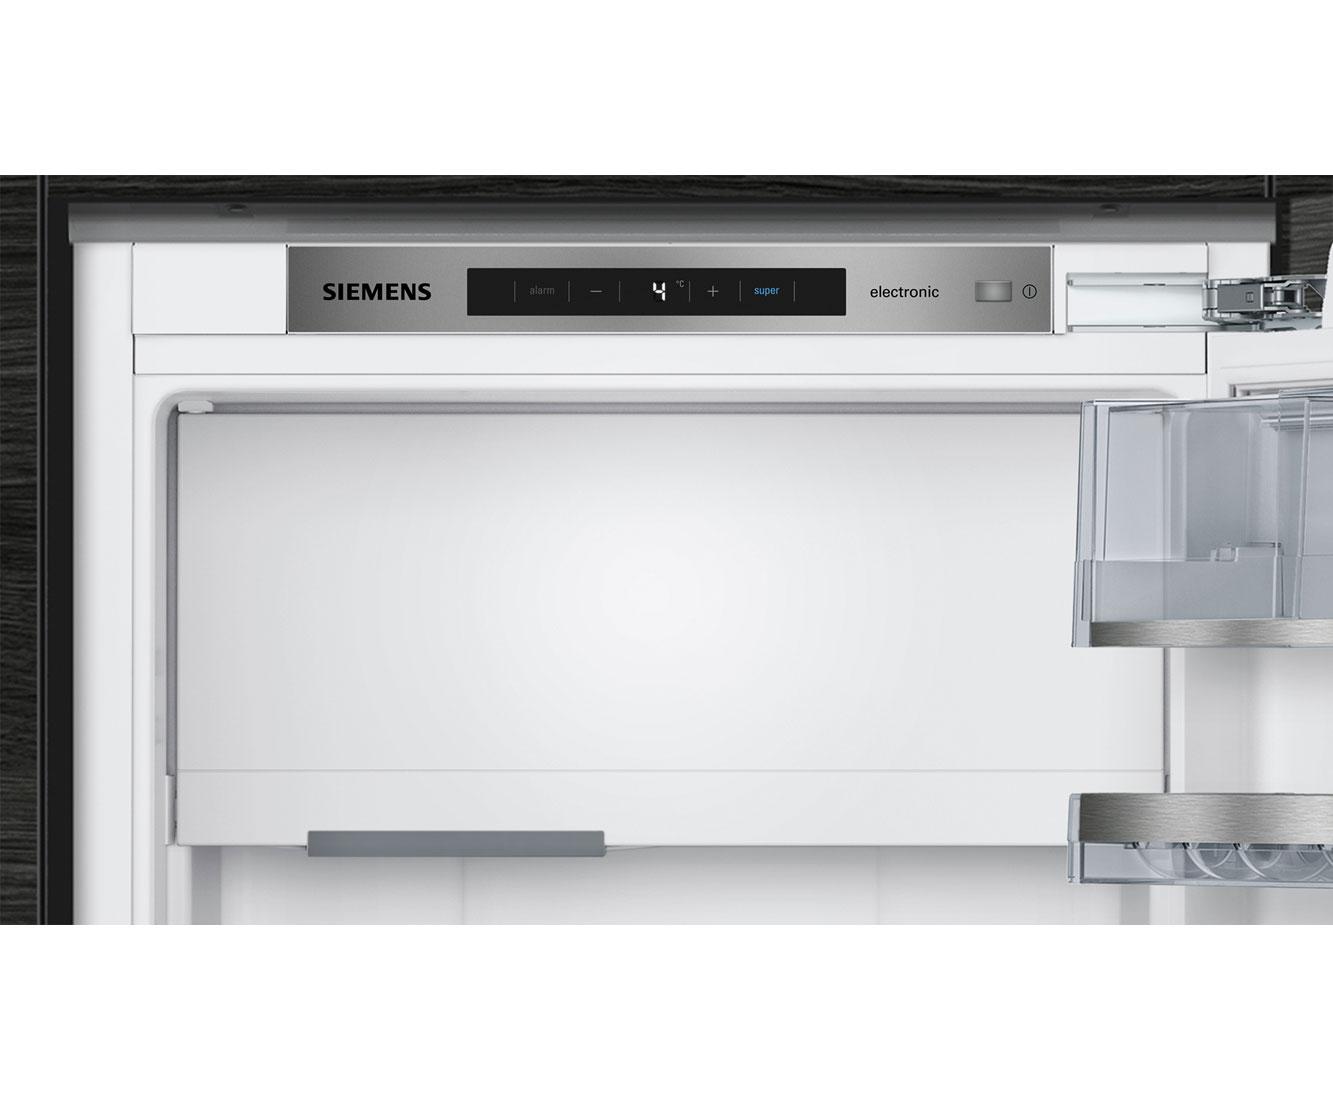 Siemens Kühlschrank : Siemens ki fad kühlschrank iq eingebaut cm weiß neu ebay